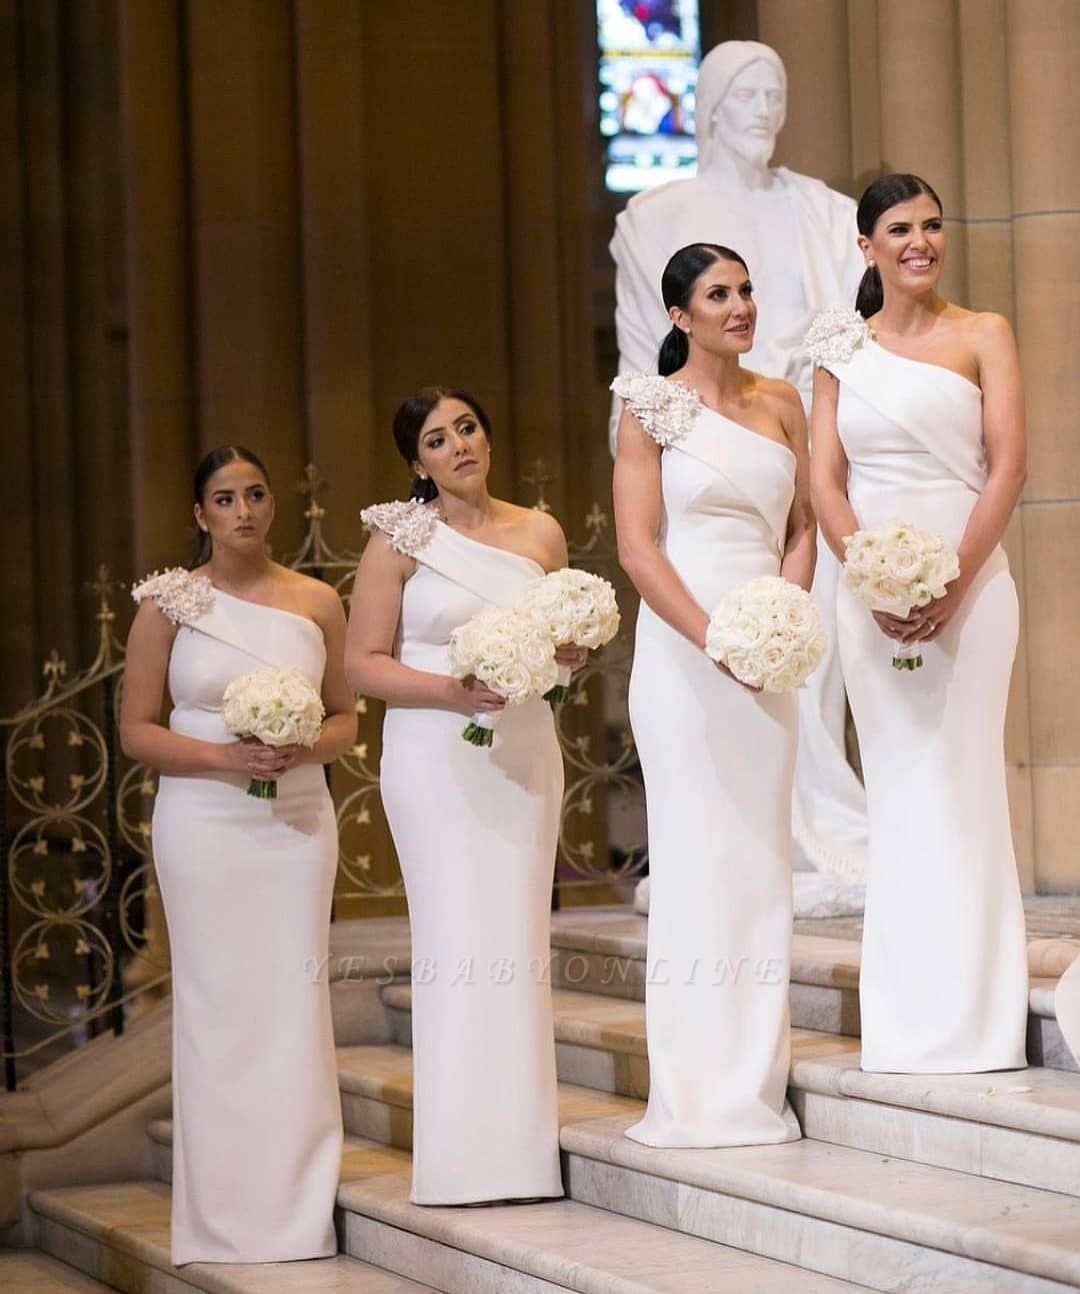 Elegant One Shoulder Sheath White Long Bridesmaid Dresses White Bridesmaid Dresses Long Bridesmaid Bridesmaid Dresses